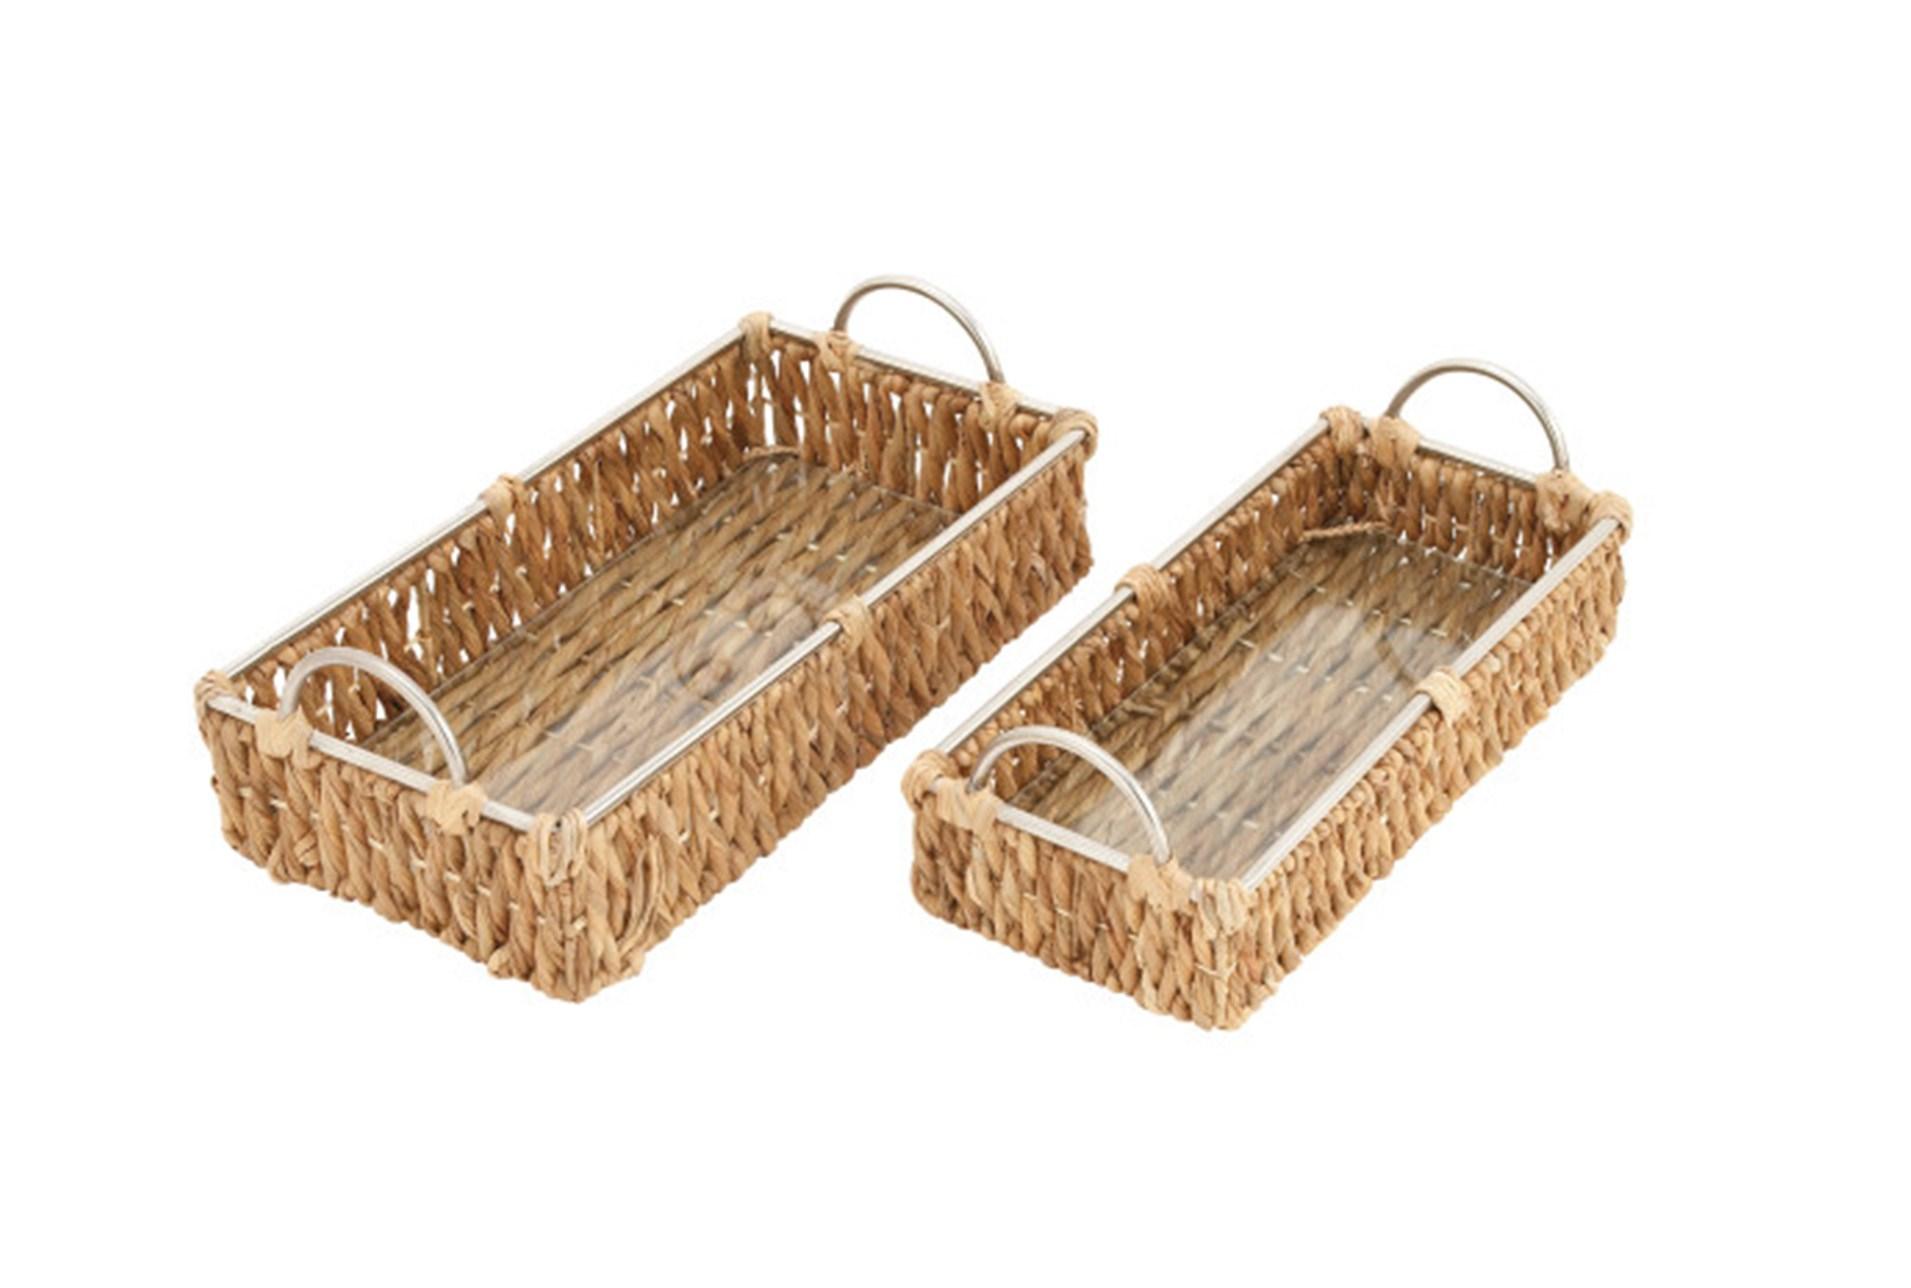 2 piece set wicker metal long baskets living spaces